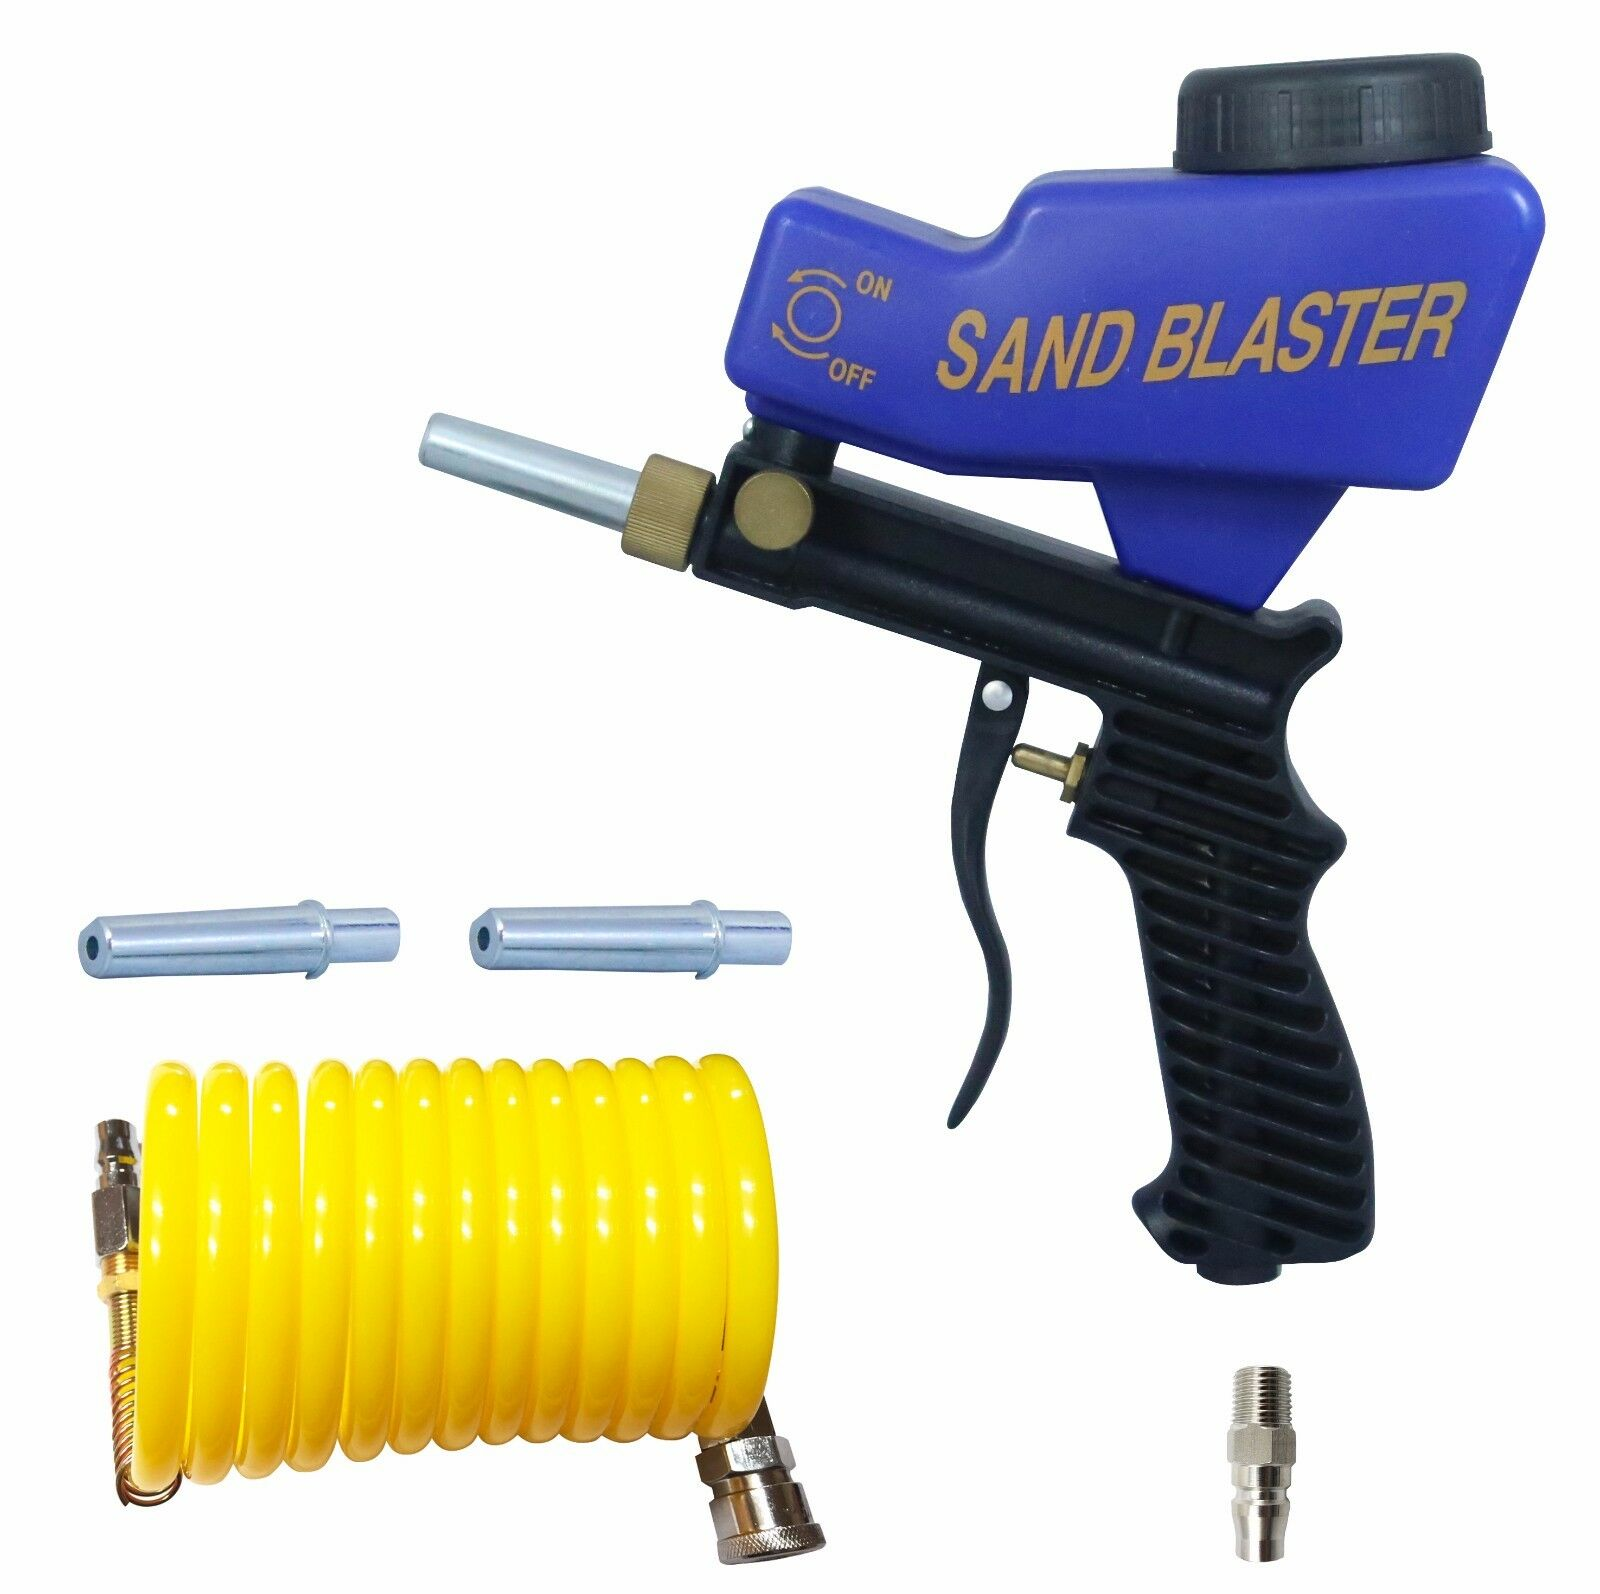 LEMATEC Sandblasting Gun With 1 4  Coupler and Nylon Air Hose Two Tips Blaster